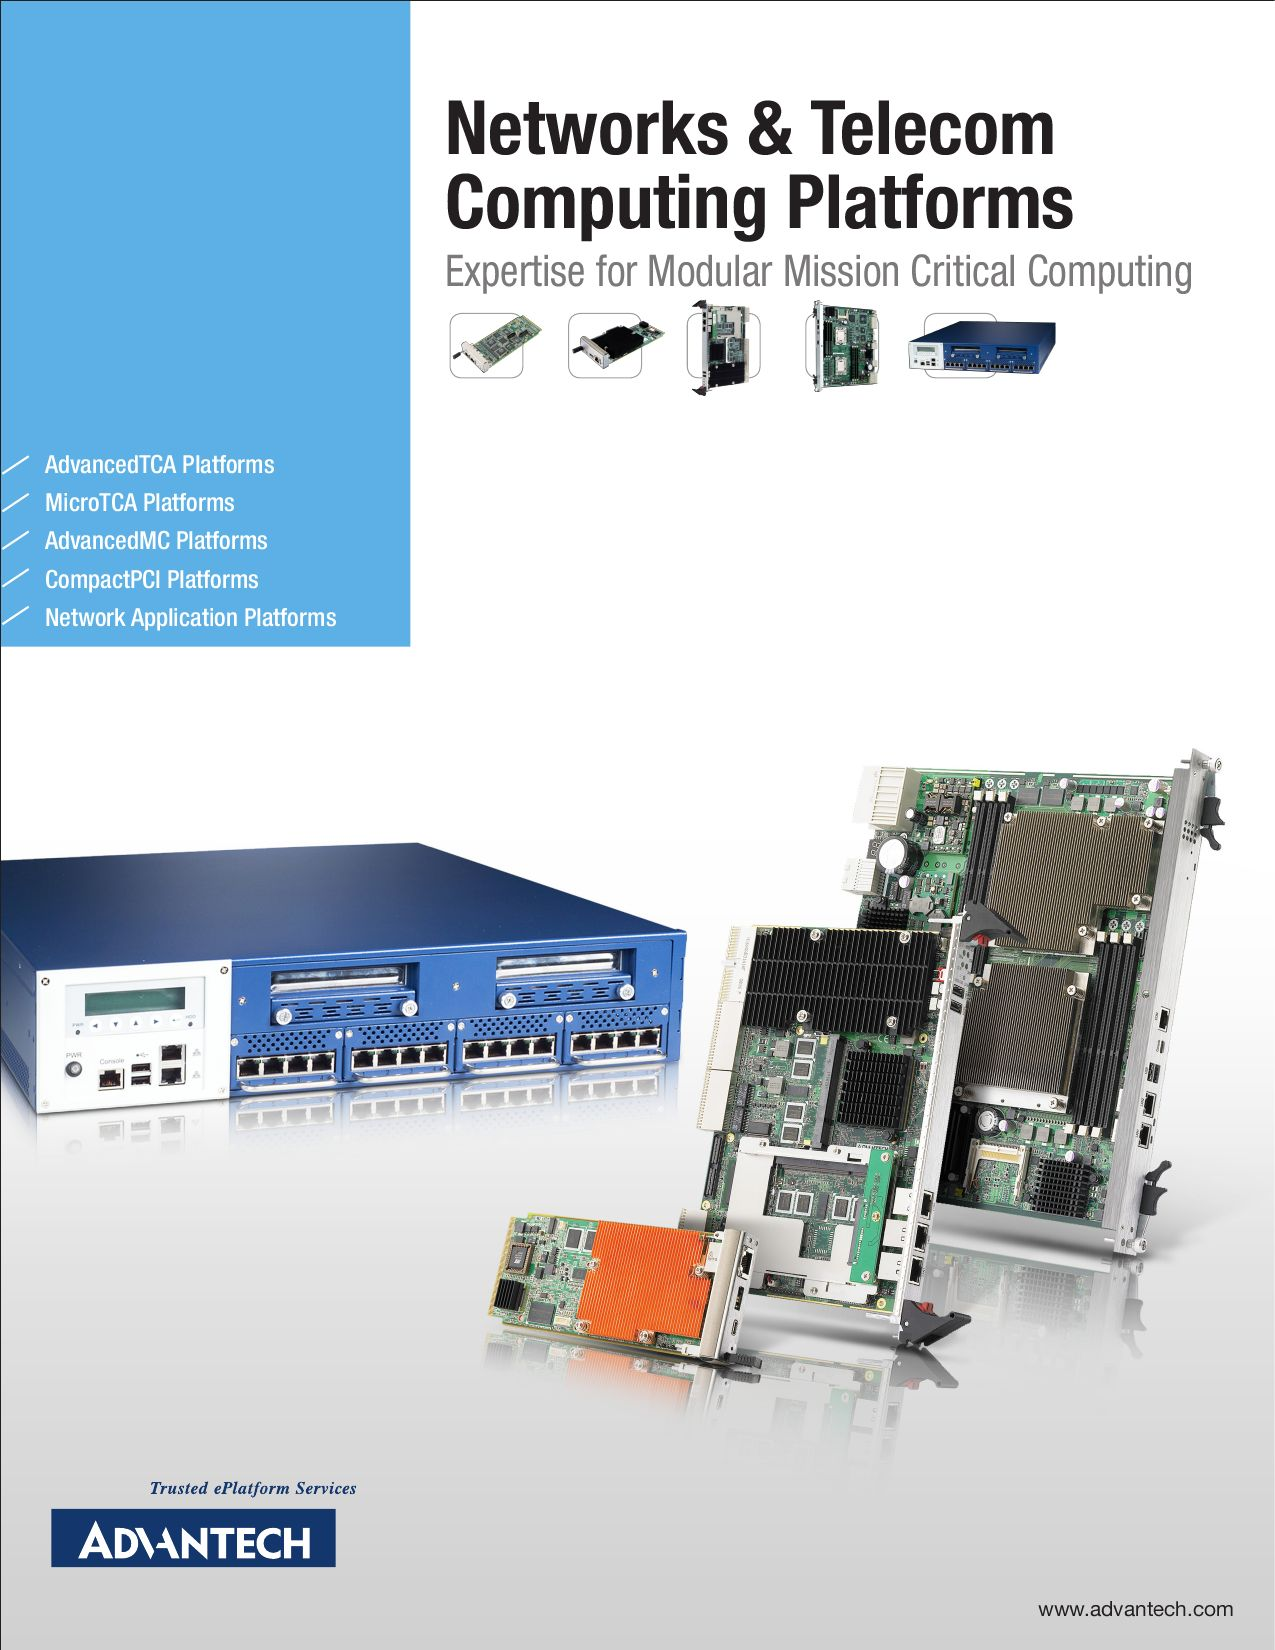 Http Advantechcomtw Catalogs Pdf 2009 Mouse Sensor Board Schematic Pcb Right Click Quotsave Asquot To Get 633941396524696846402009 Ncg Brochure By Advantech Issuu